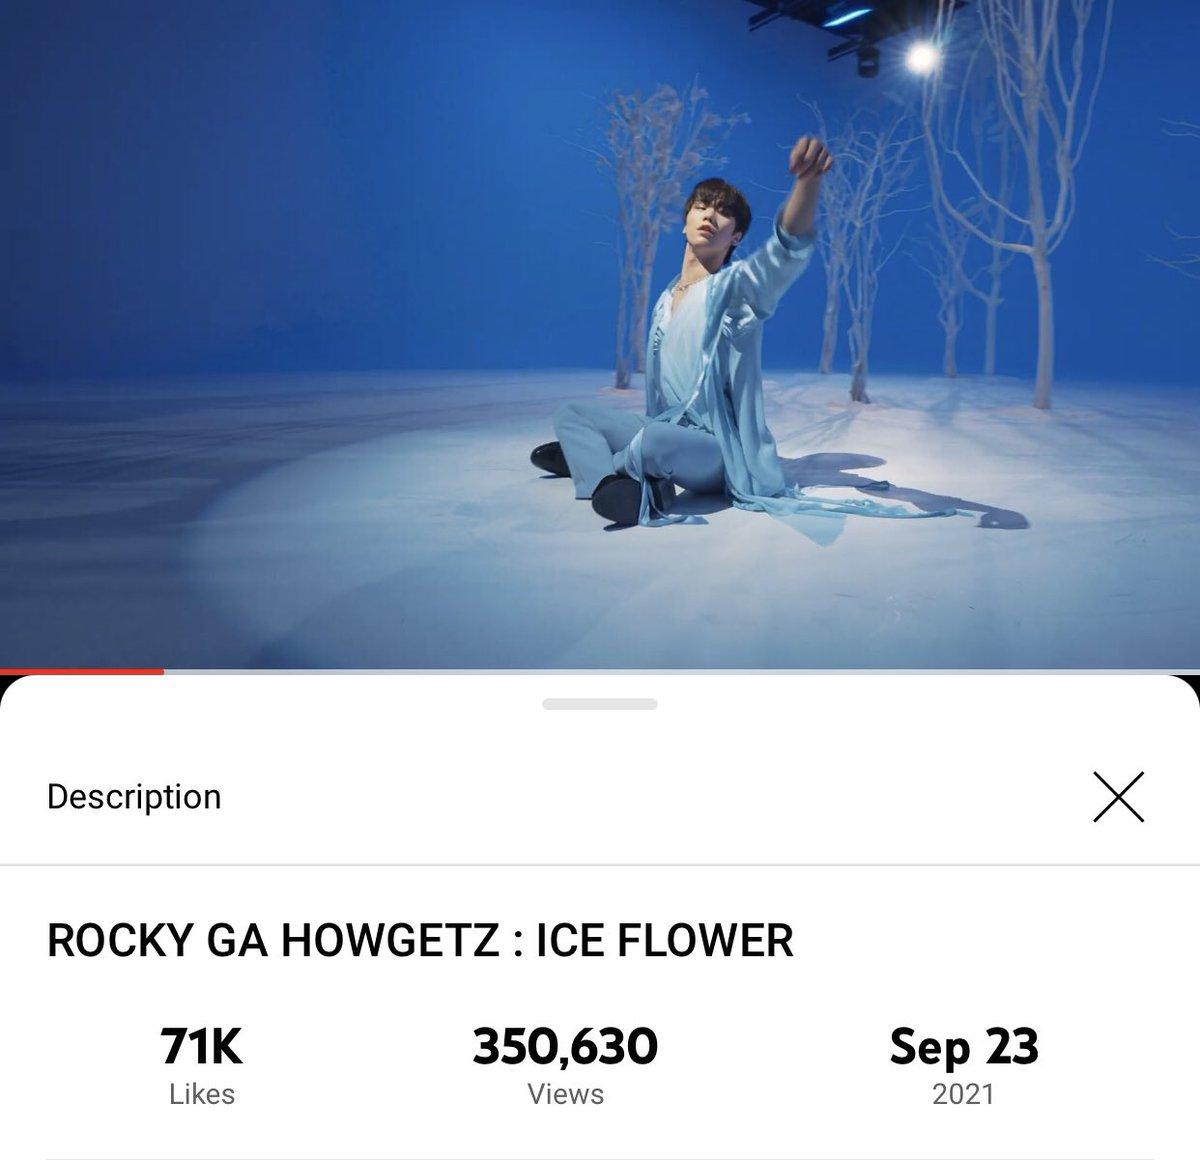 [📈] 210928 10:30 PM KST ROCKY GA HOWGETZ: ICE FLOWER Official Channel: 350,630views (🔺296) 🔗youtu.be/5GAksgvR8nM #아스트로 #ASTRO #라키 #ROCKYGAHOWGETZ #ICE_FLOWER #라키가하겠지 @offclASTRO